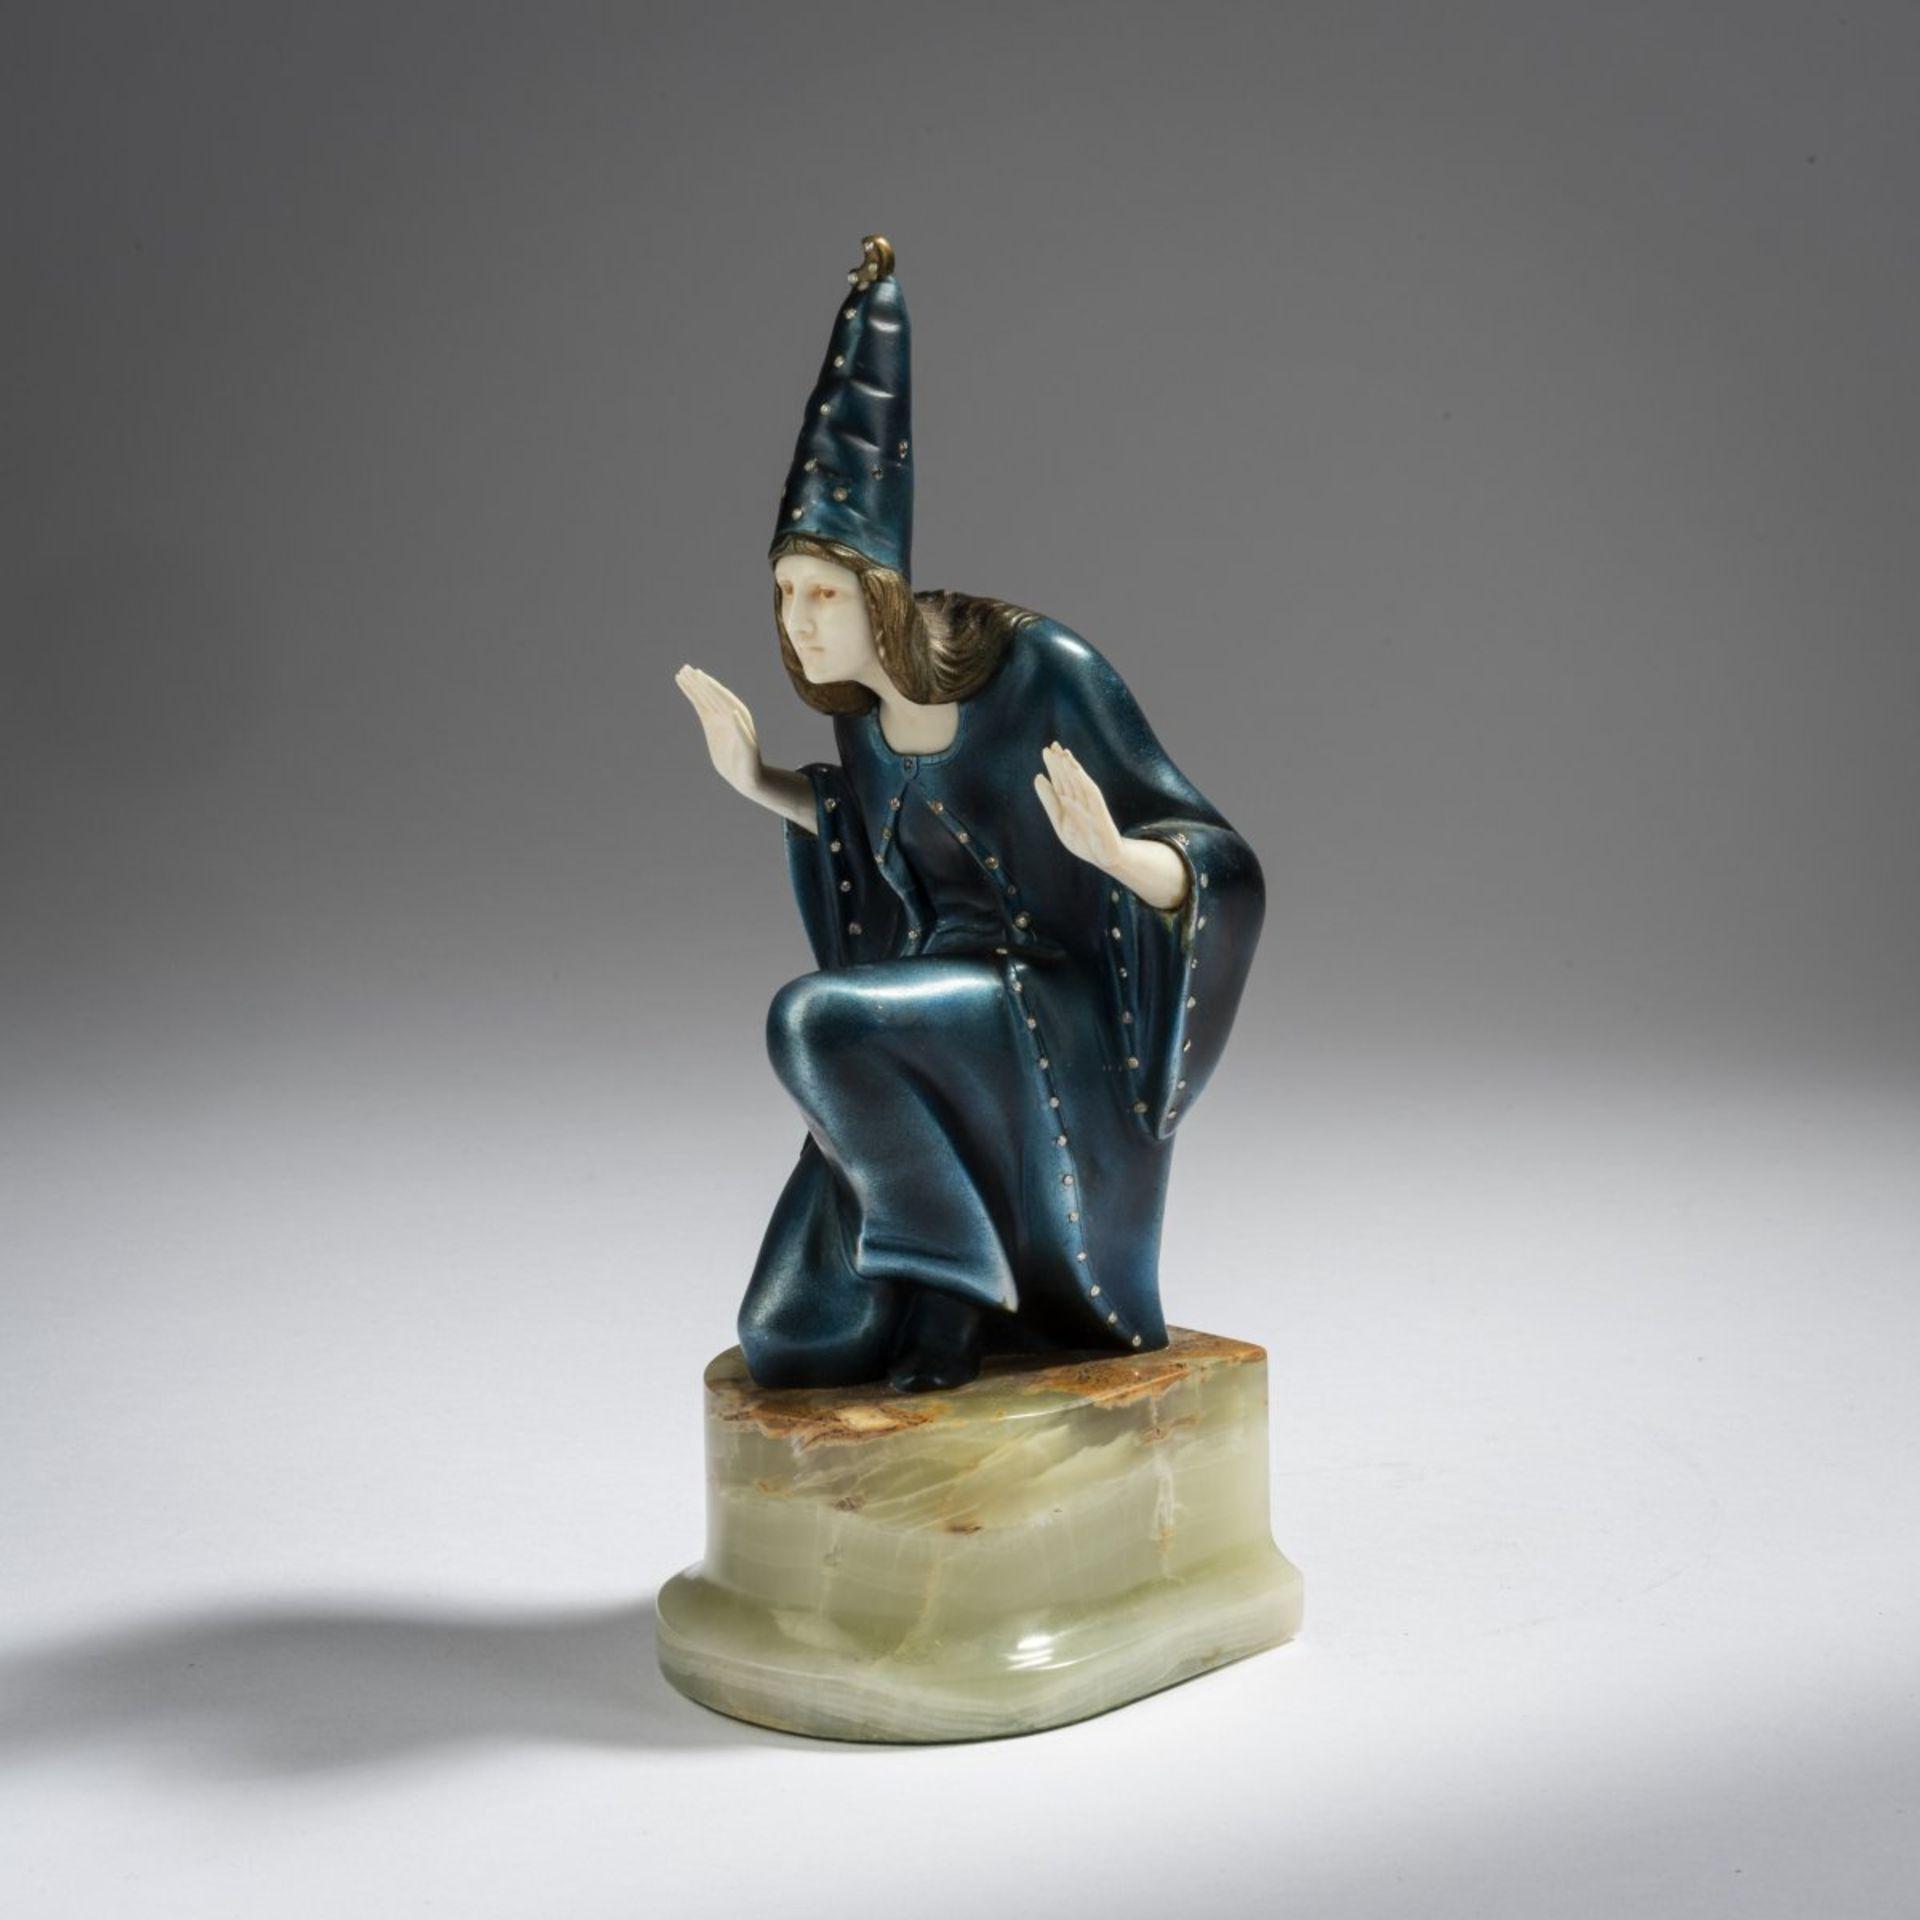 Franz Peleschka-Lunard, Zauberin, 1920er Jahre - Bild 3 aus 7